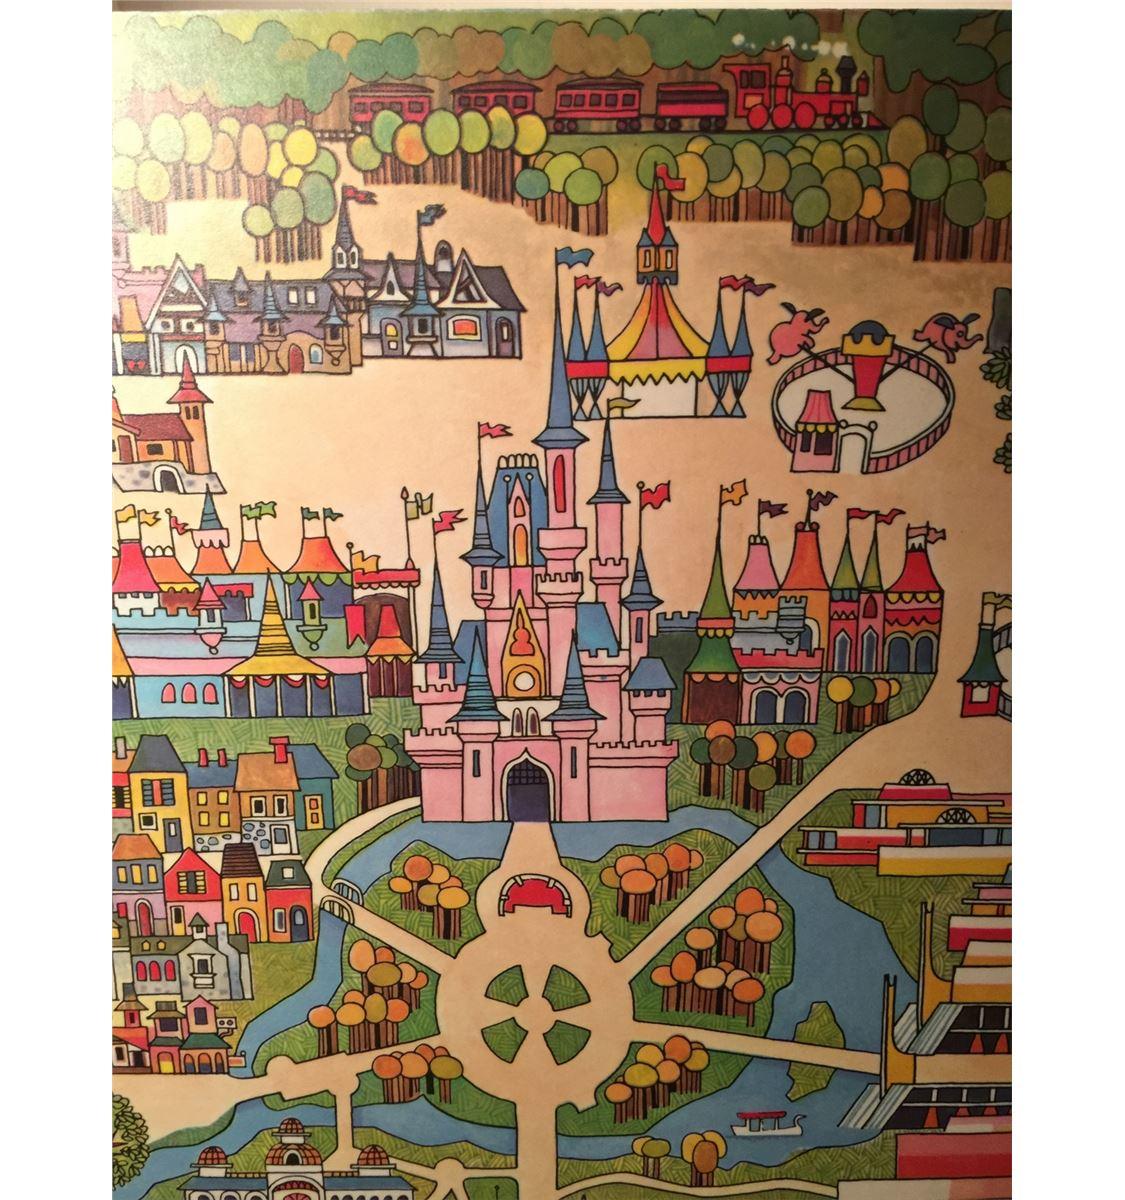 rare original 1971 walt disney world map wall art from polynesian hotel